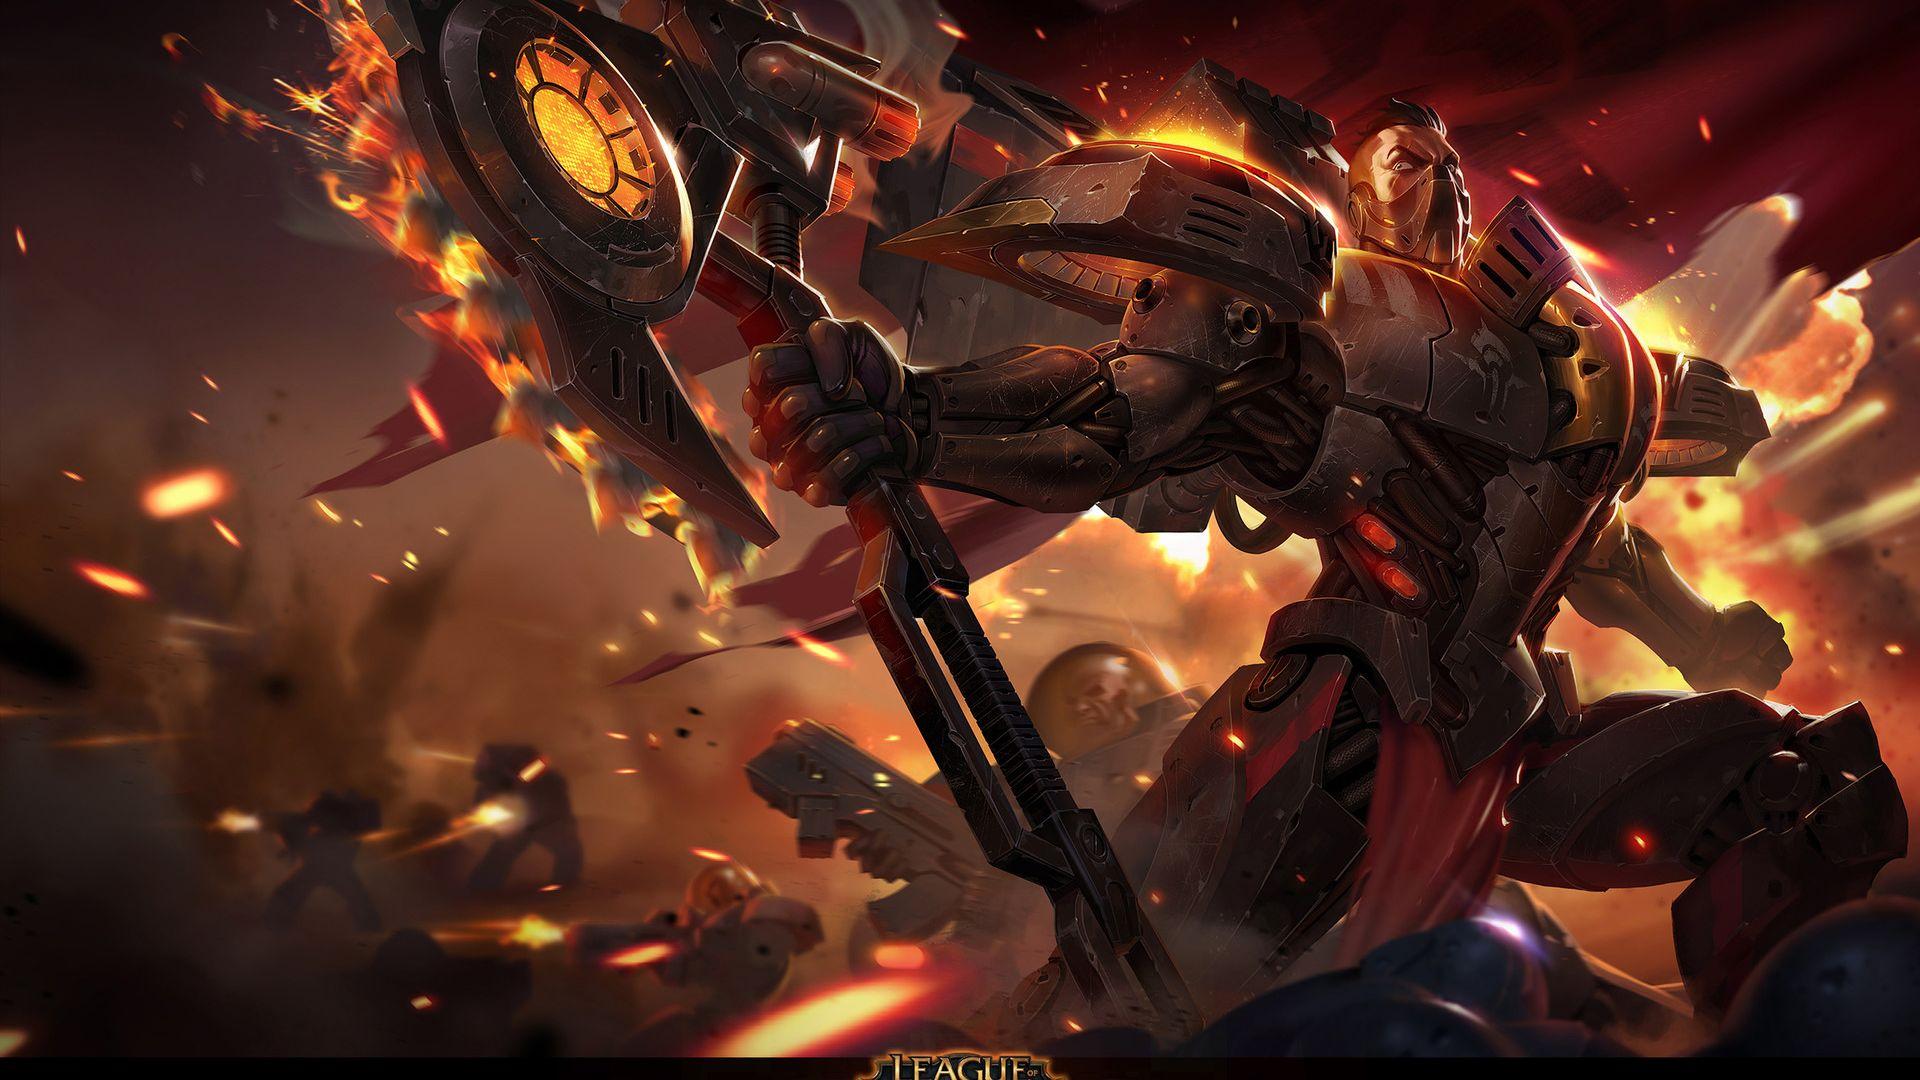 Desktop Wallpaper Darius League Of Legends Online Game Hd Image